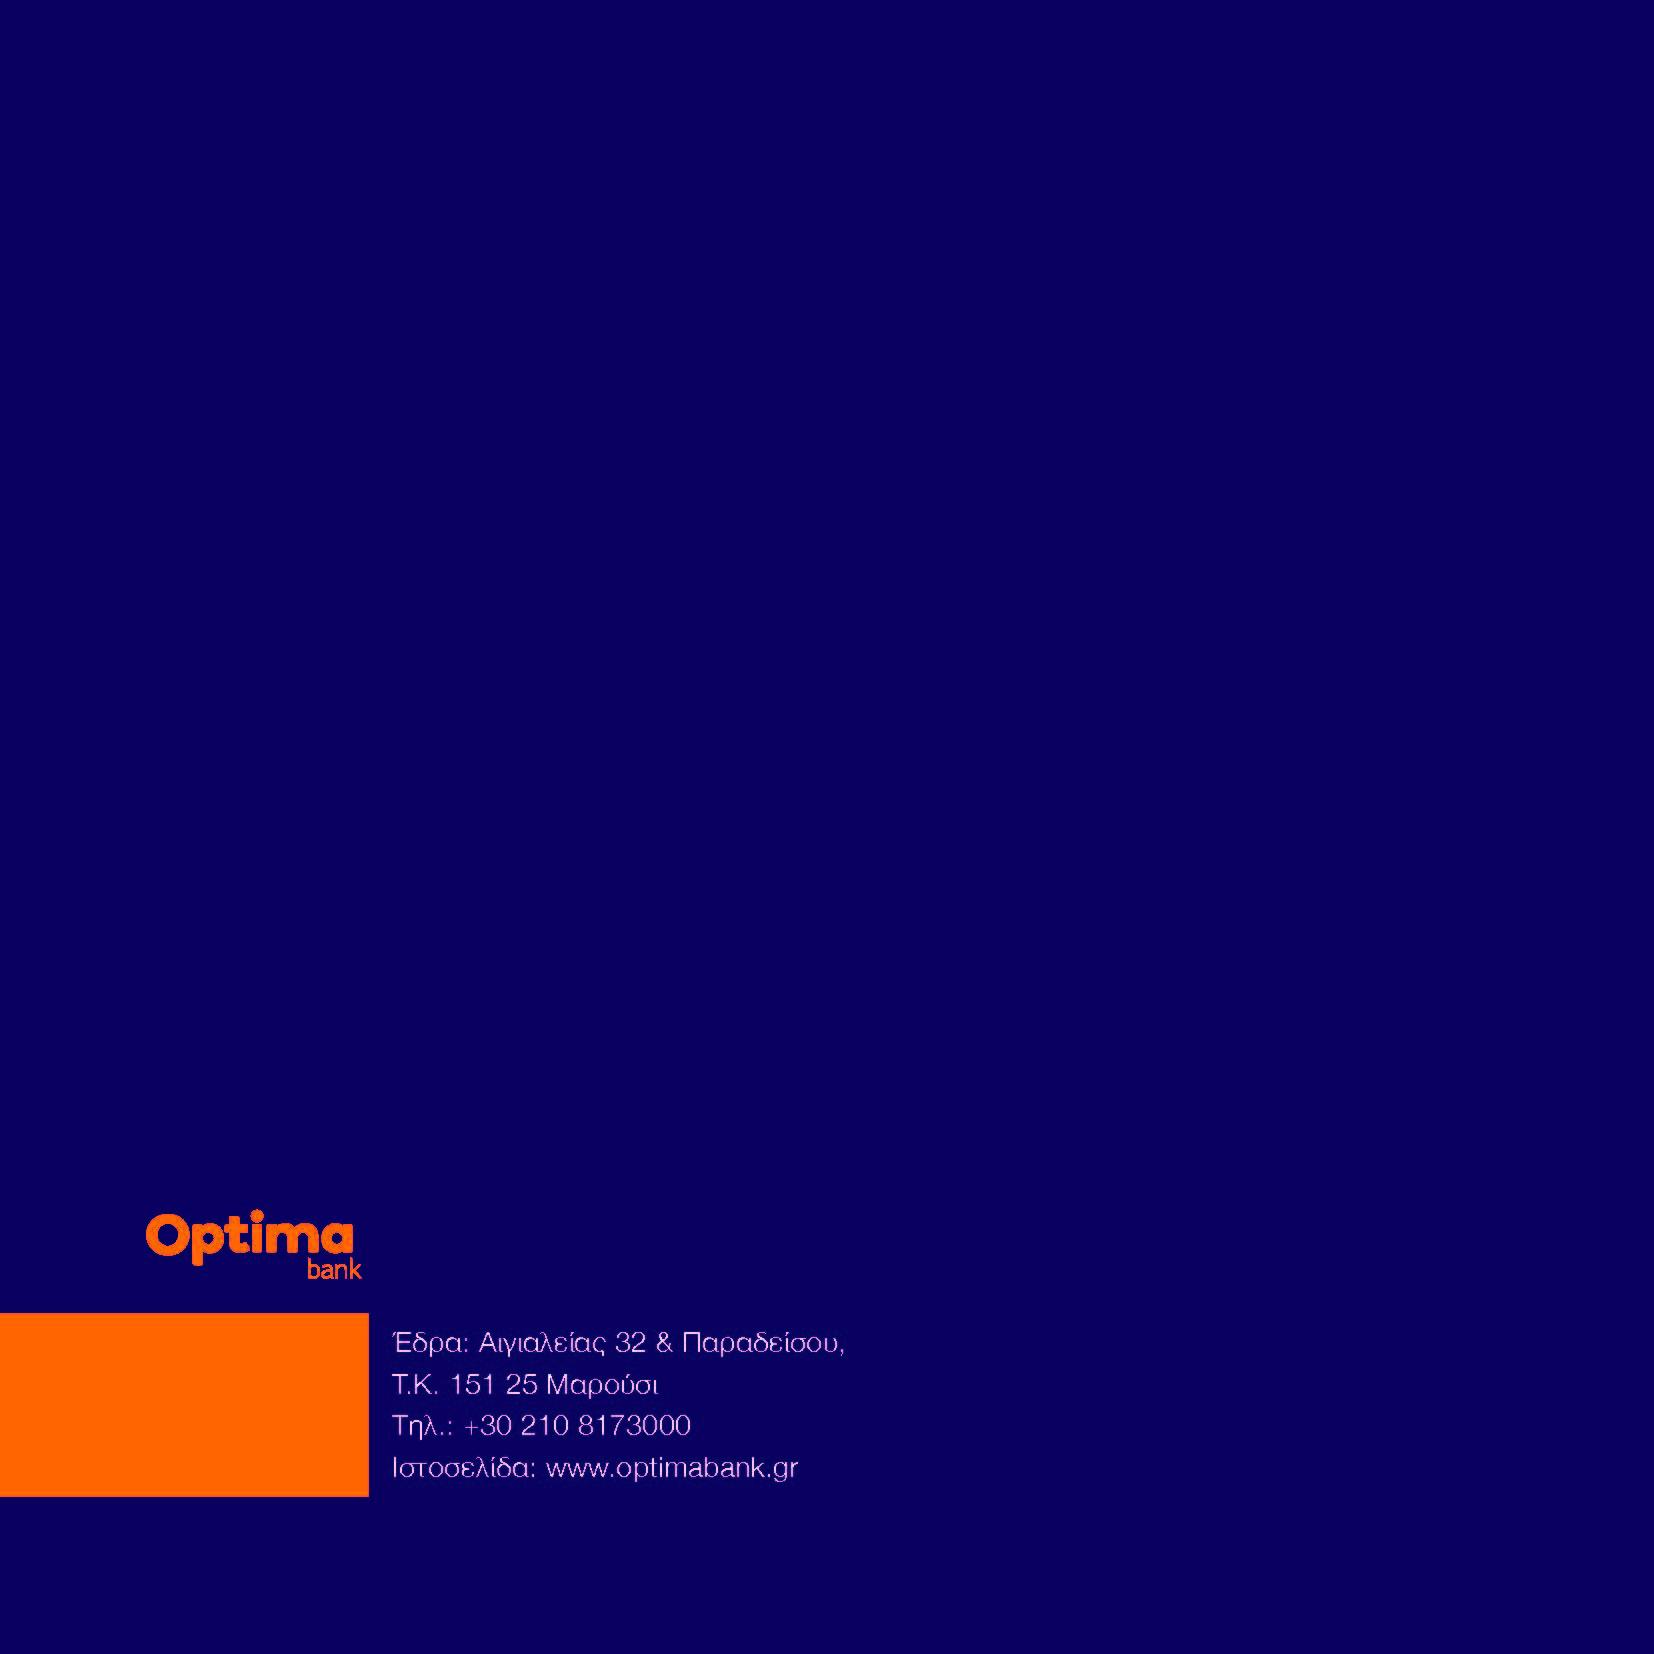 https://www.jib.gr/wp-content/uploads/2020/09/OPTIMA-BANK-BOOKLET-WEB_Page_102.jpg